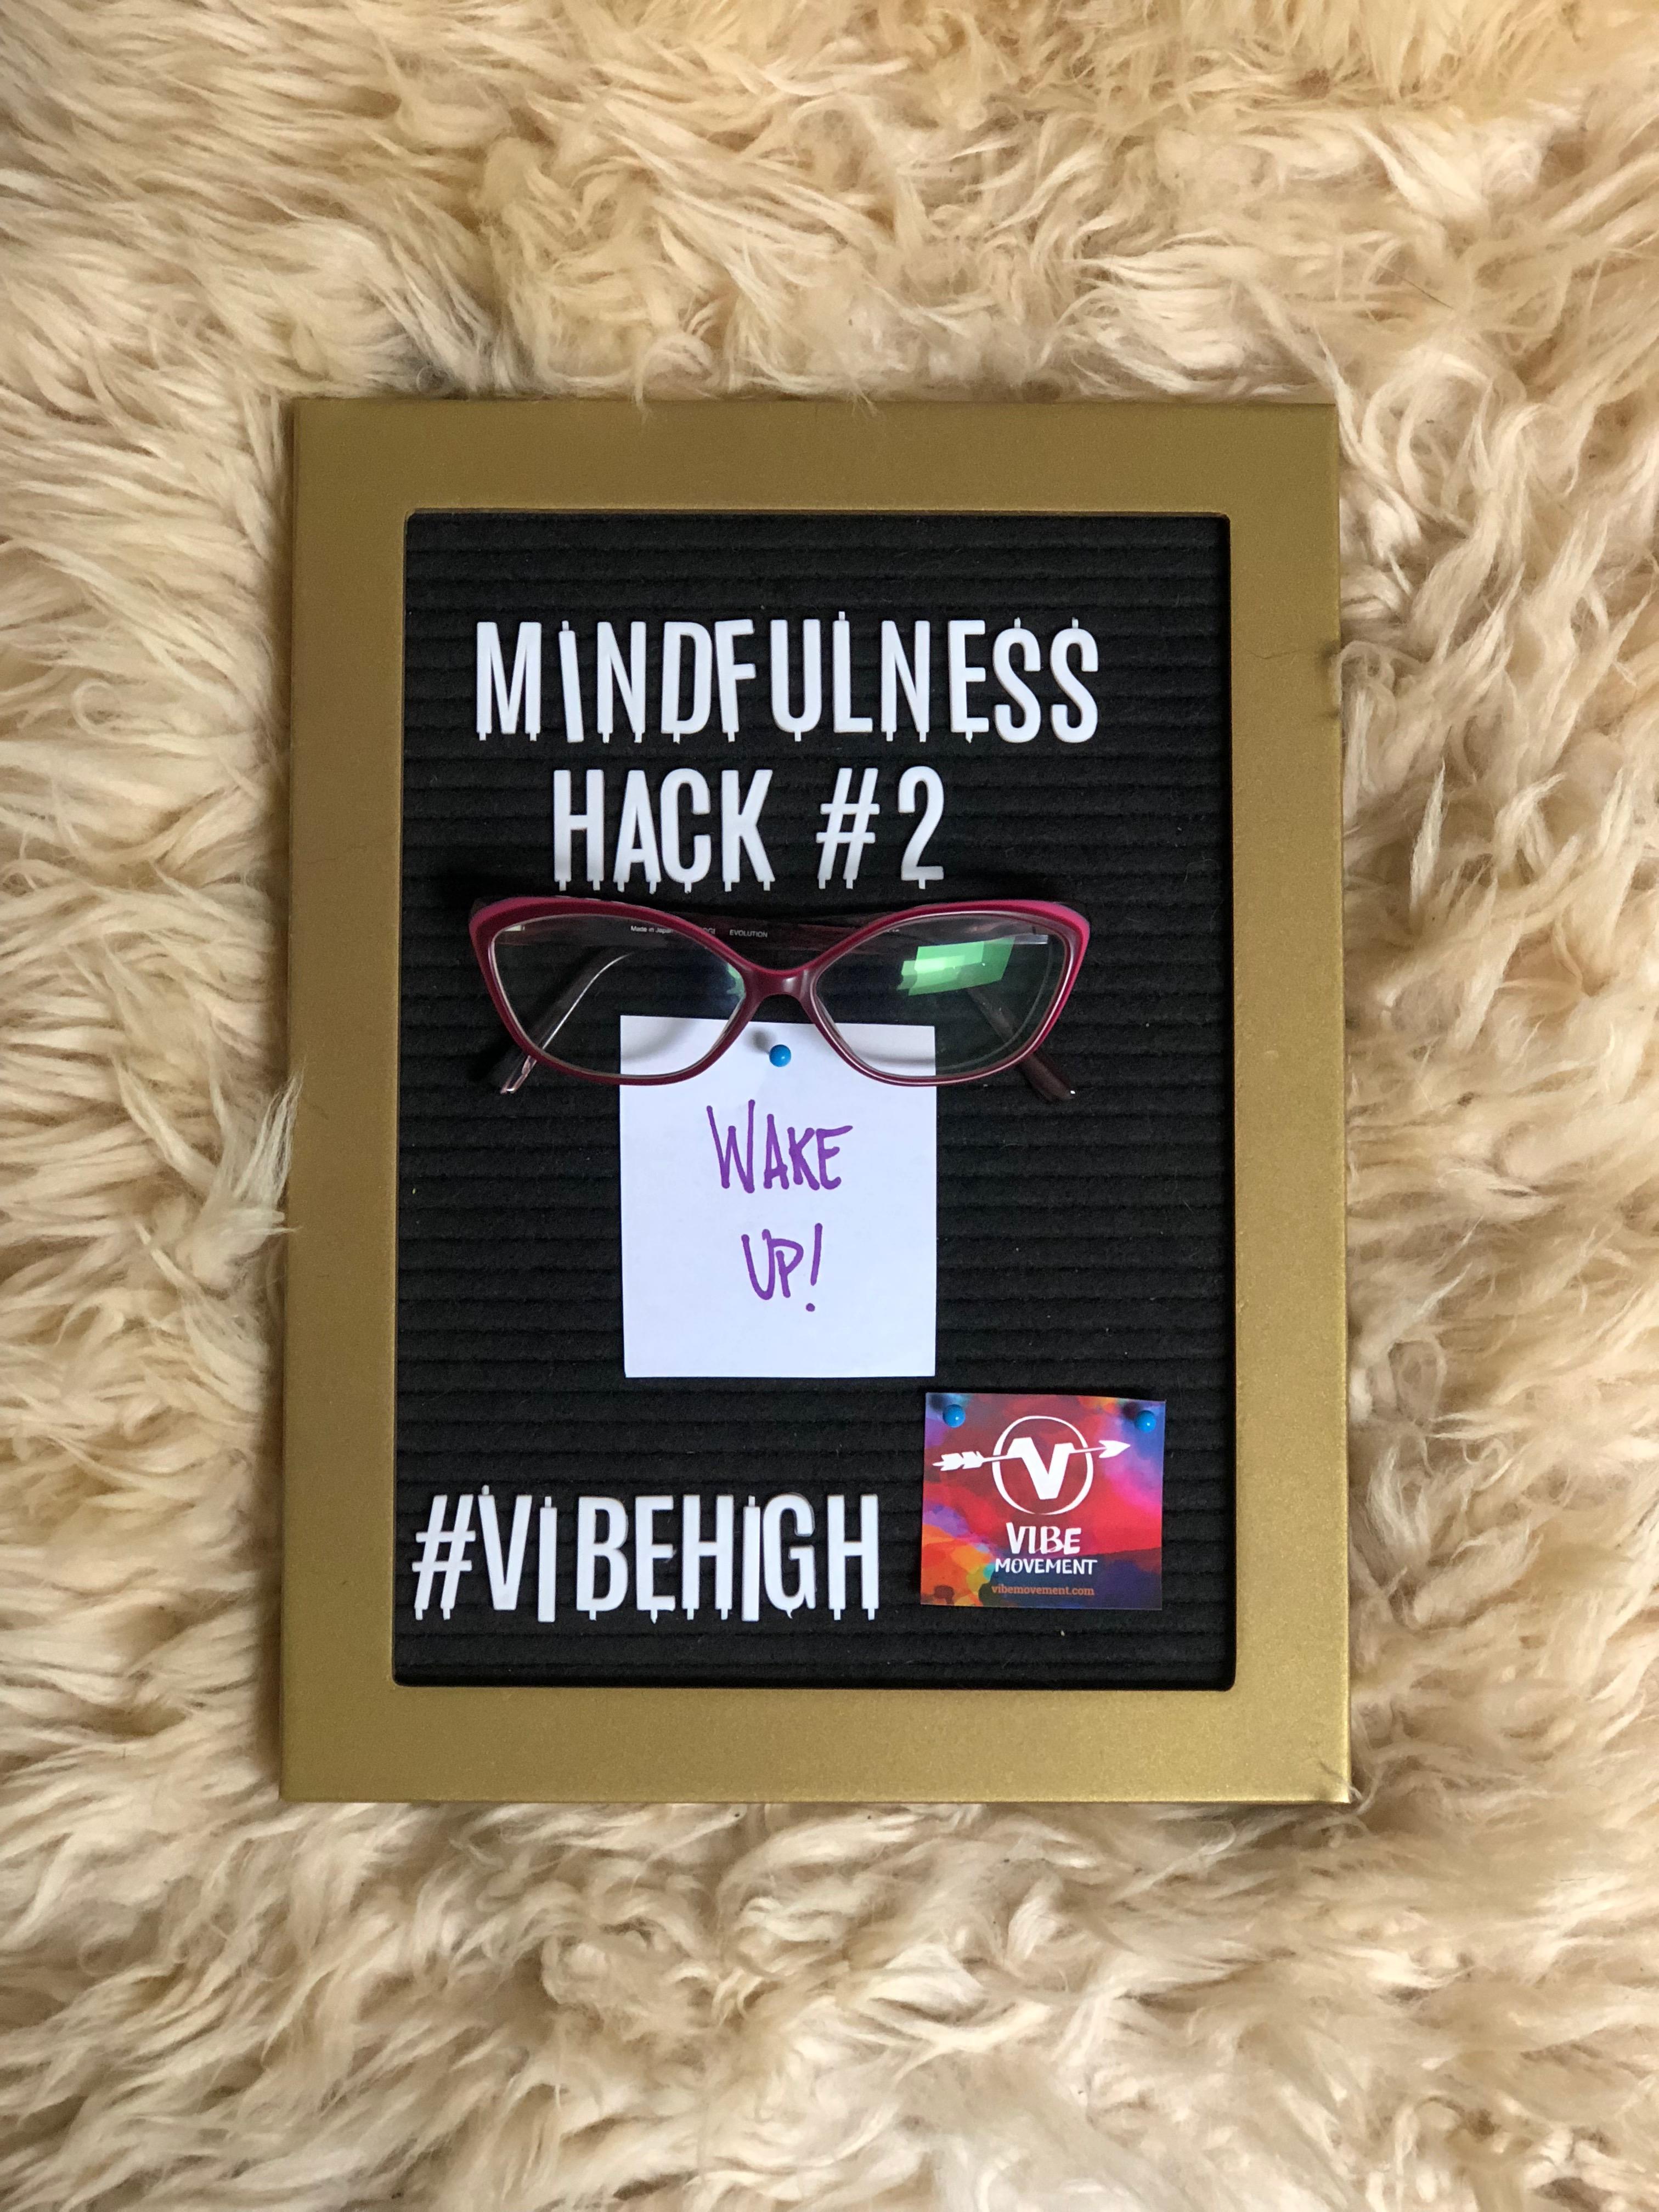 Mindfulness Hack #2: Wake UP!